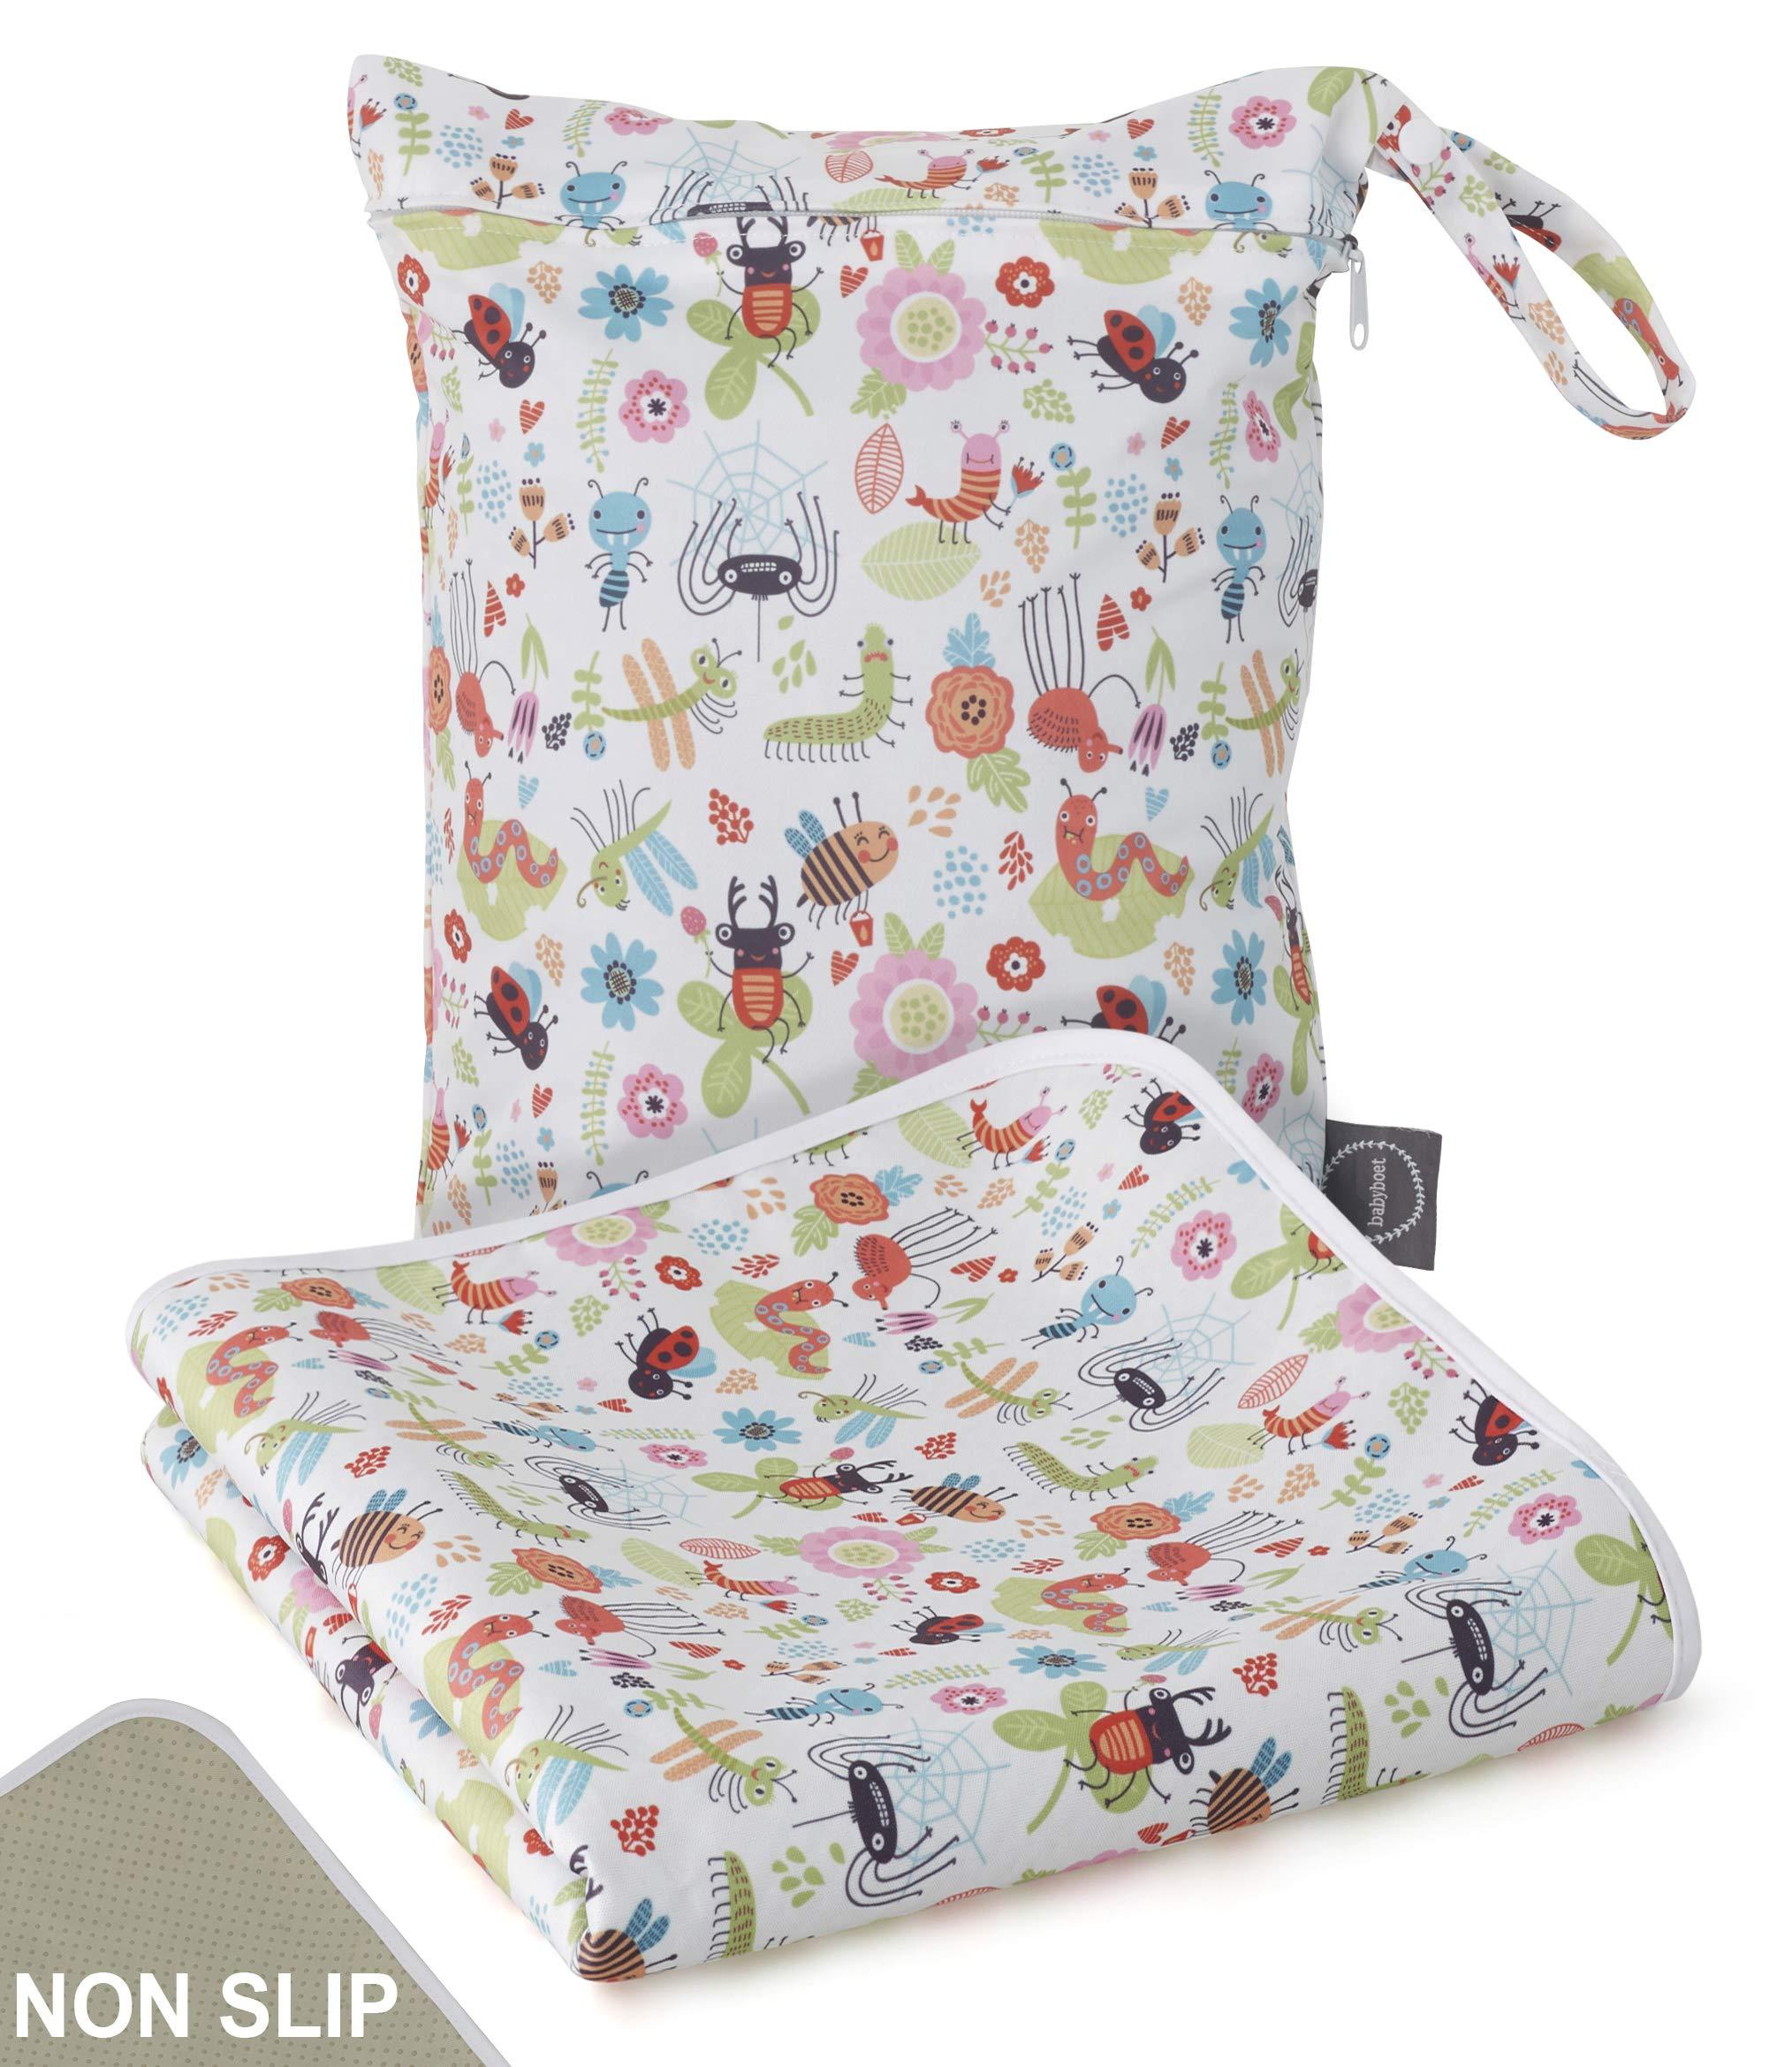 Splat Mat for Baby - Washable Waterproof Non-Slip High Chairs Floor Mat Multi-Purpose Playmat for Arts, Crafts, Feeding Plus Waterproof Wet Bag 51'' X 51'' (Beetles) by BABYBOET